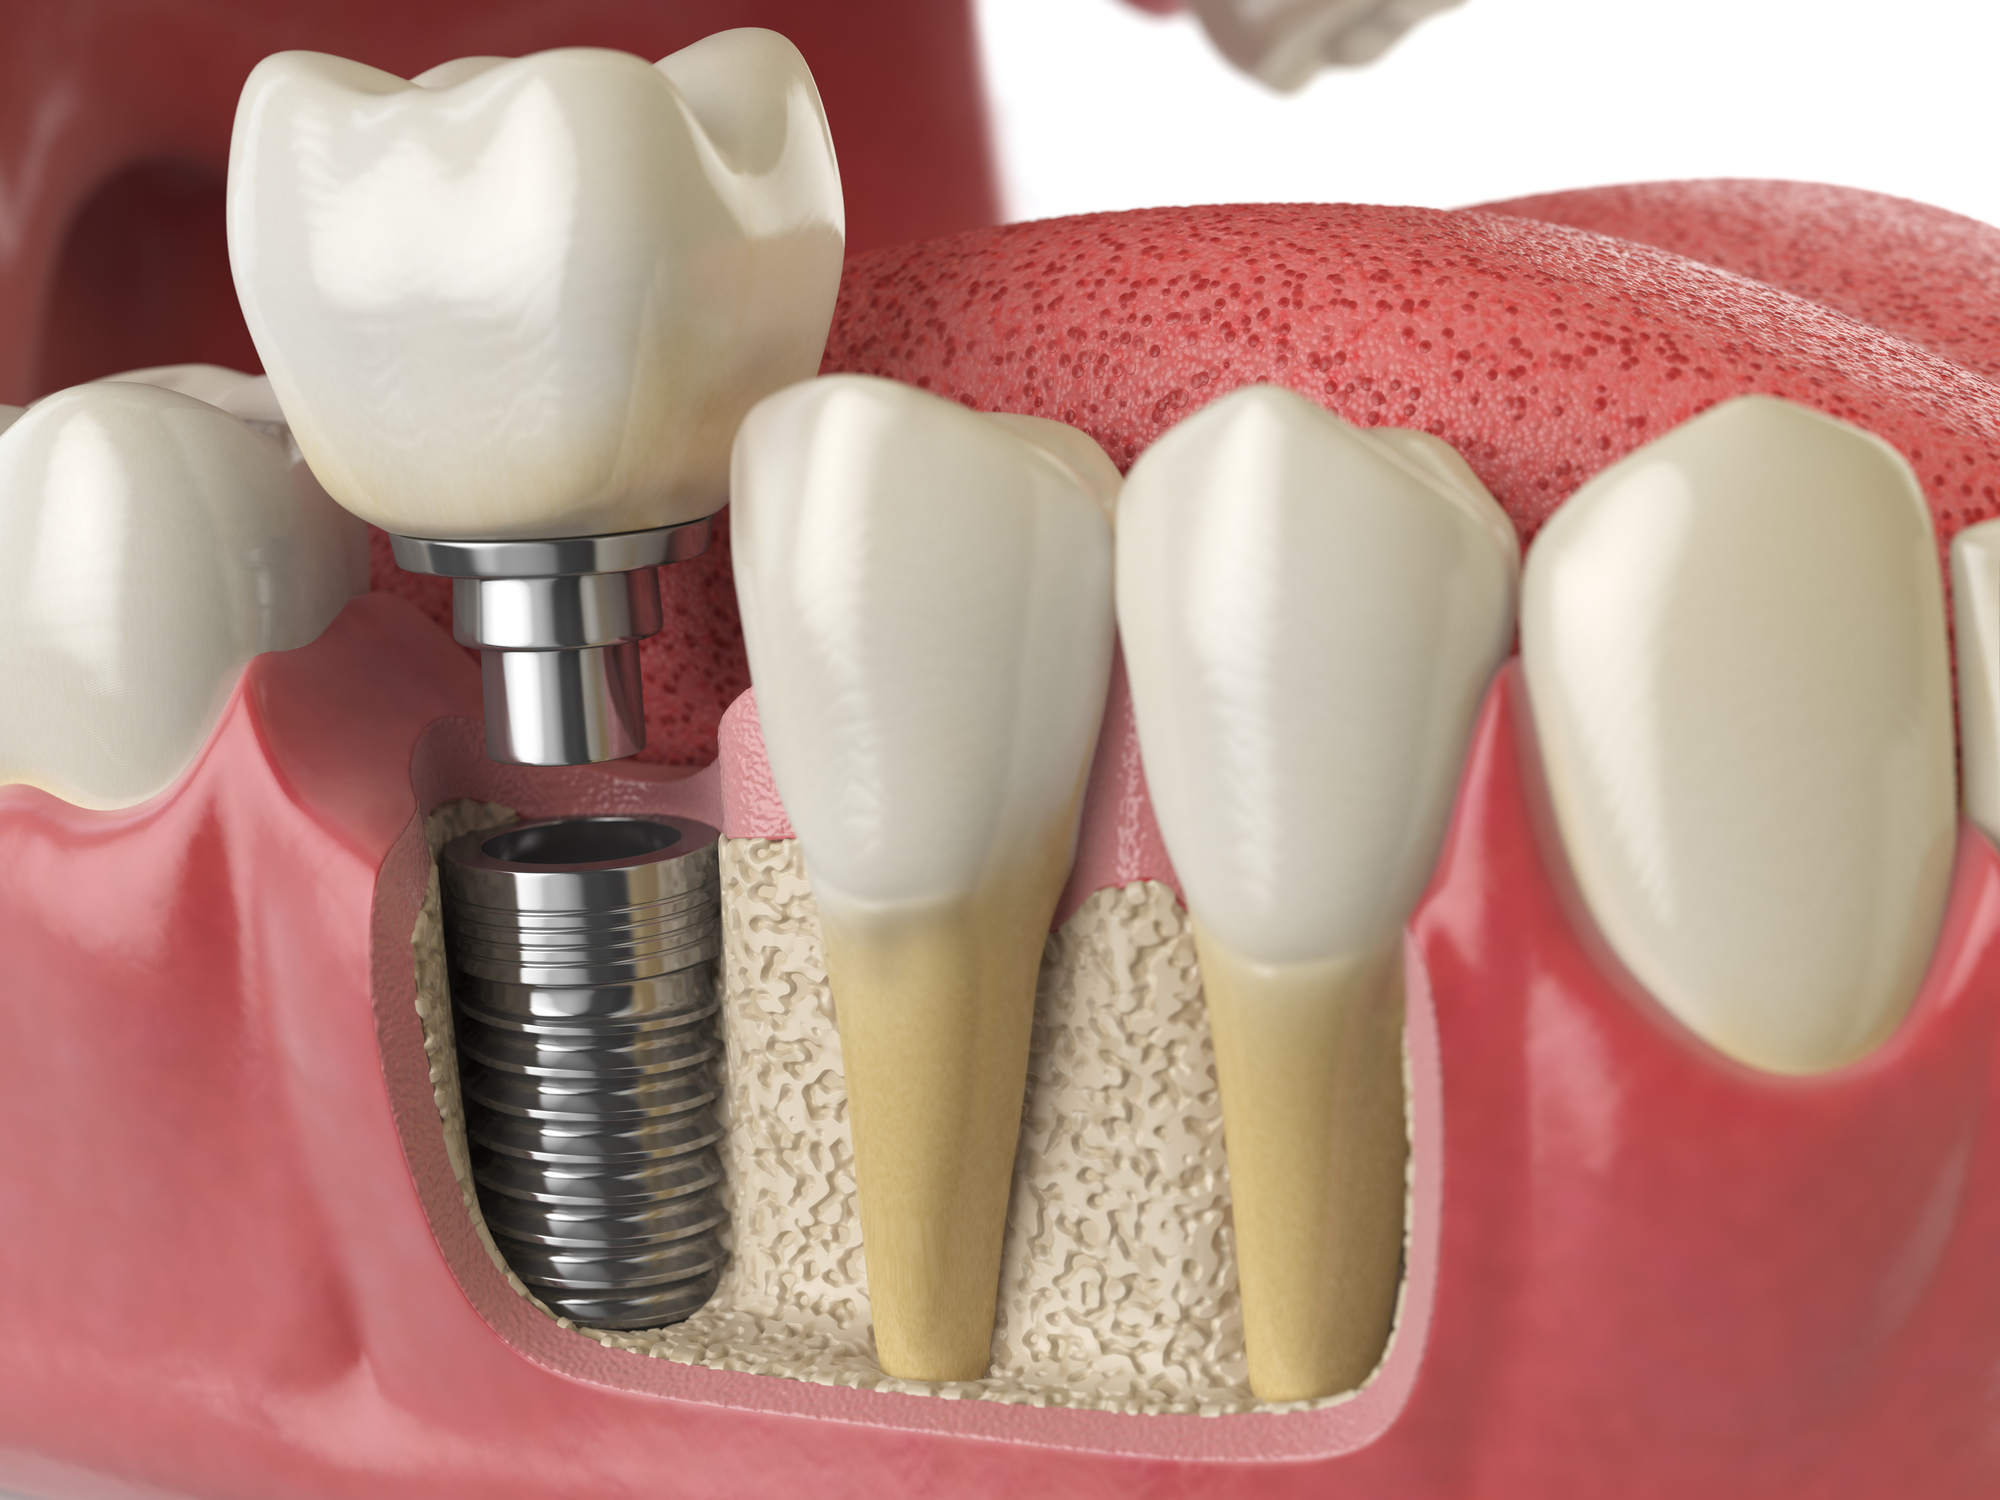 Anatomy of healthy teeth and tooth dental implant in human denturra.